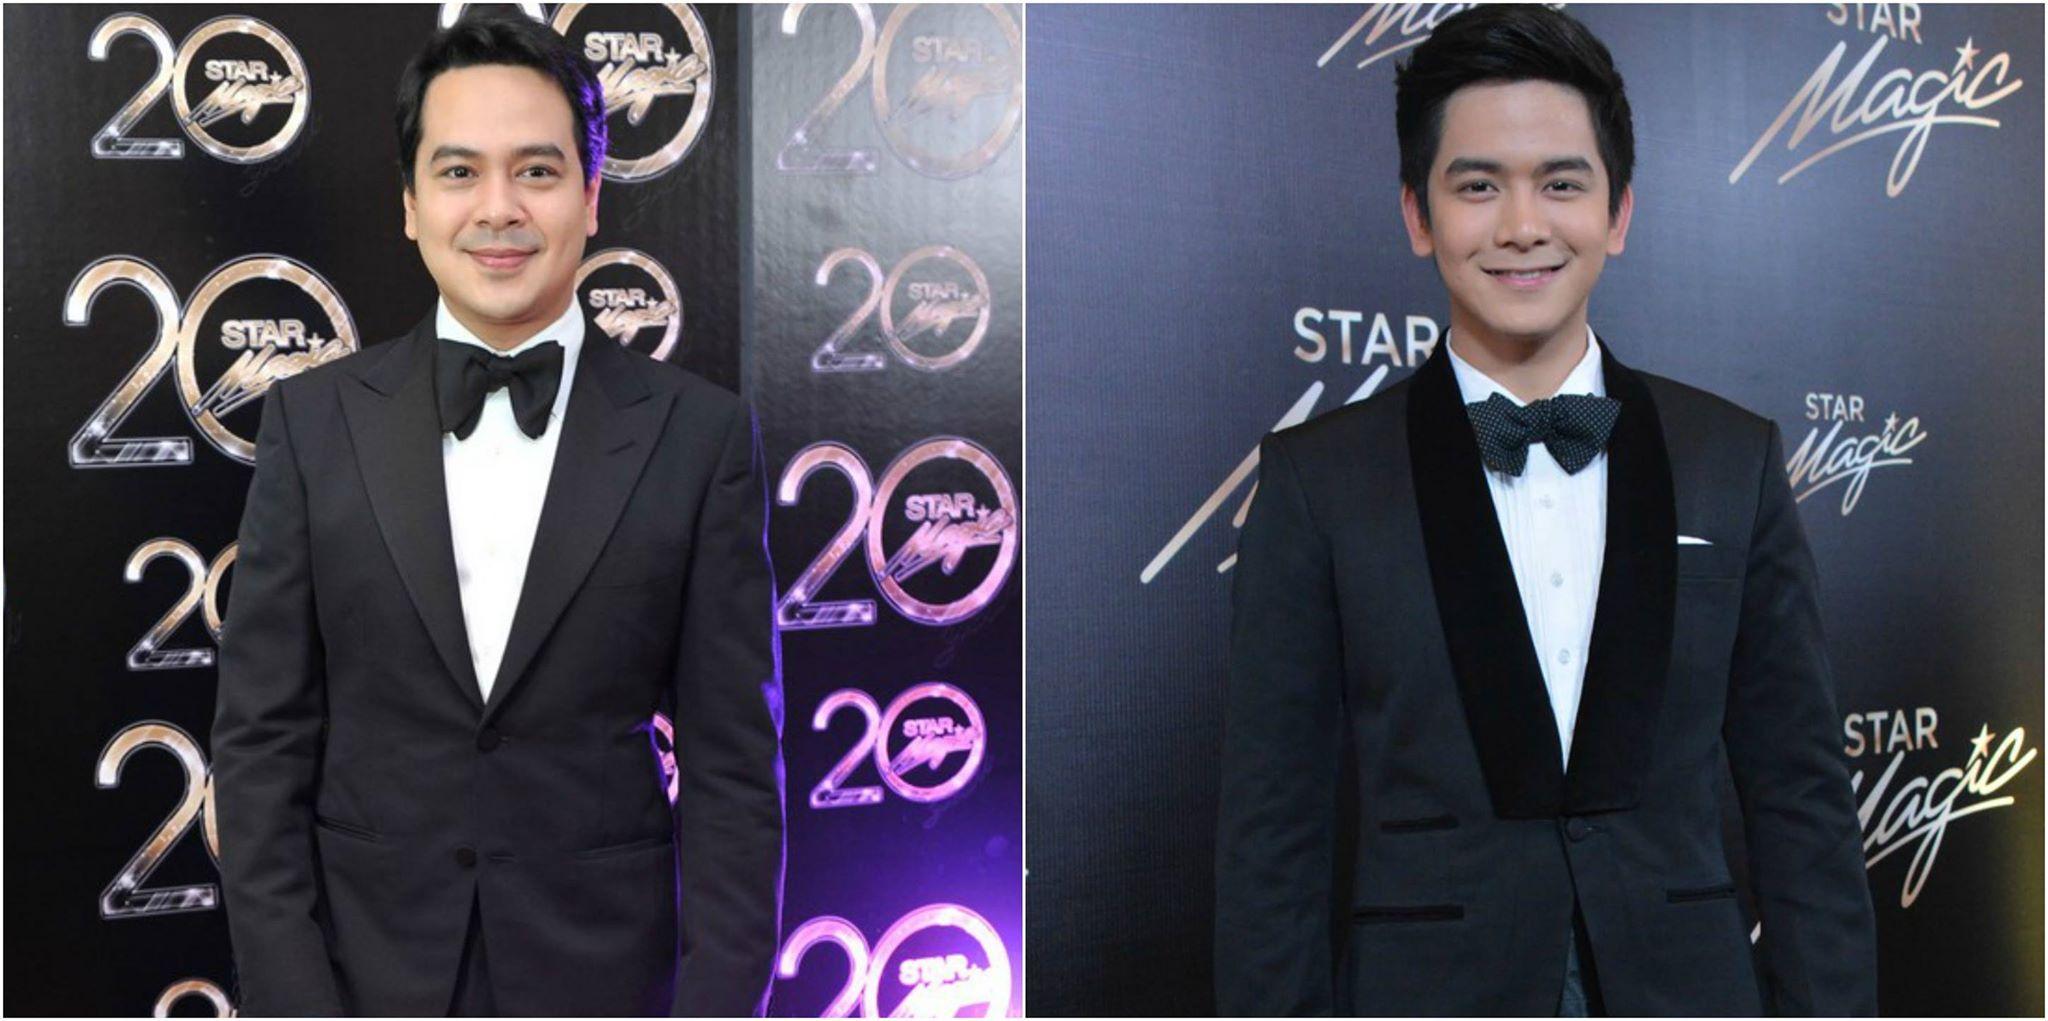 Celebrity Doppelgangers: Kapamilya Stars Who Look Alike!